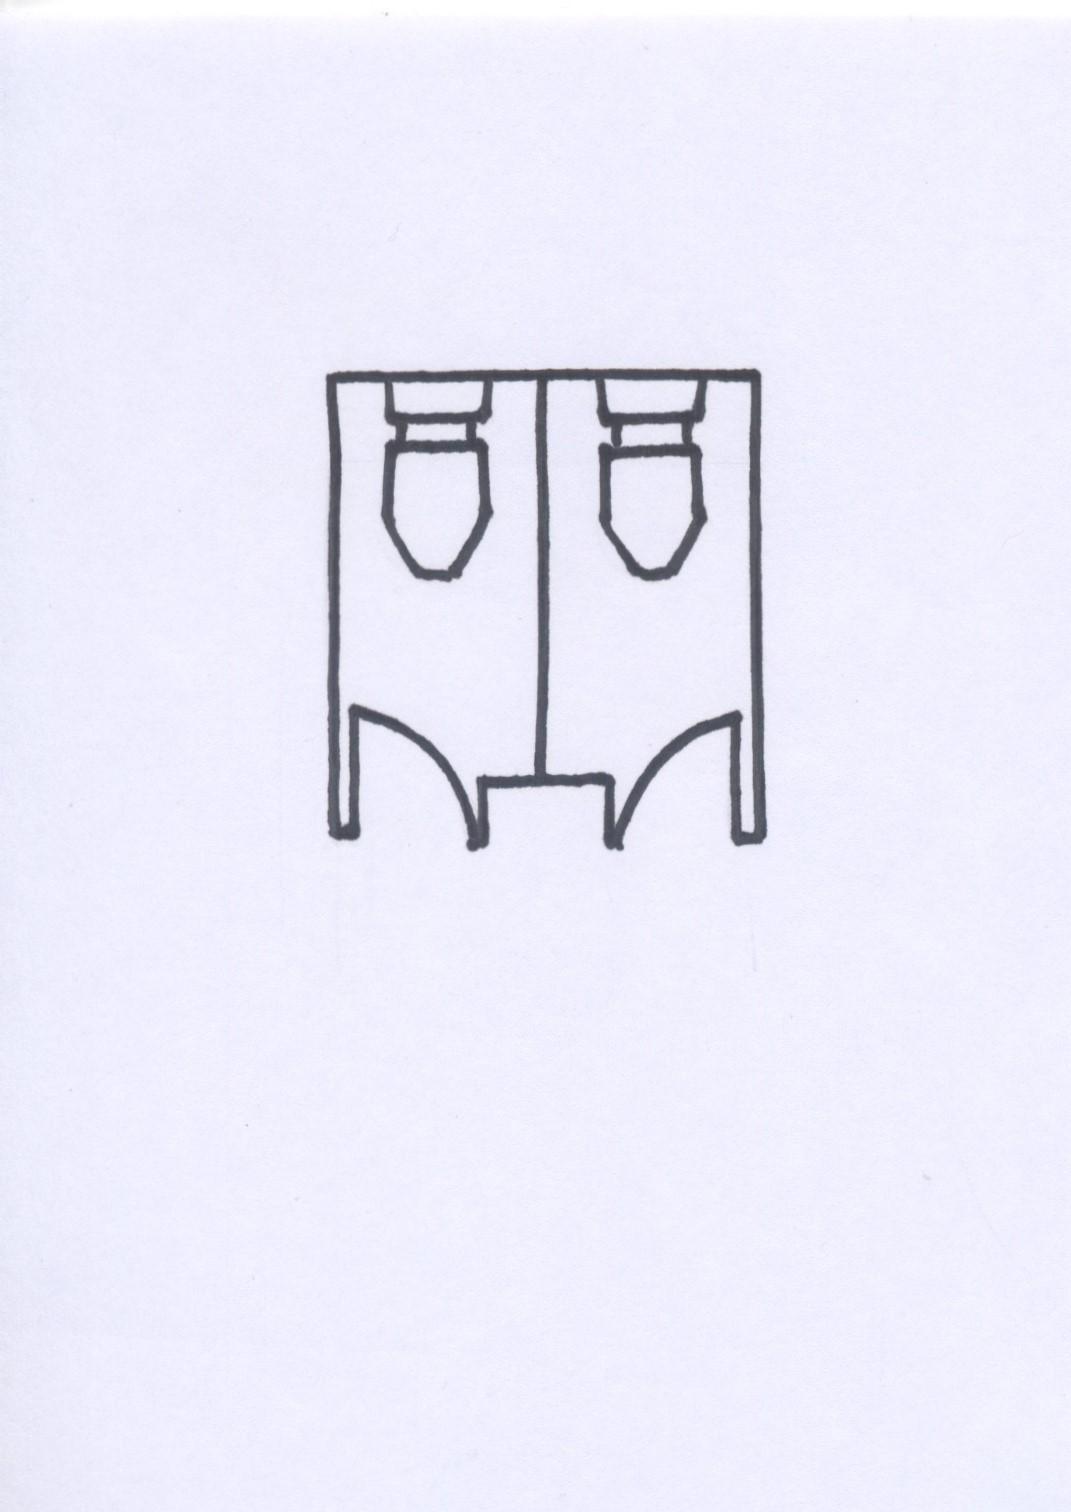 W12-1